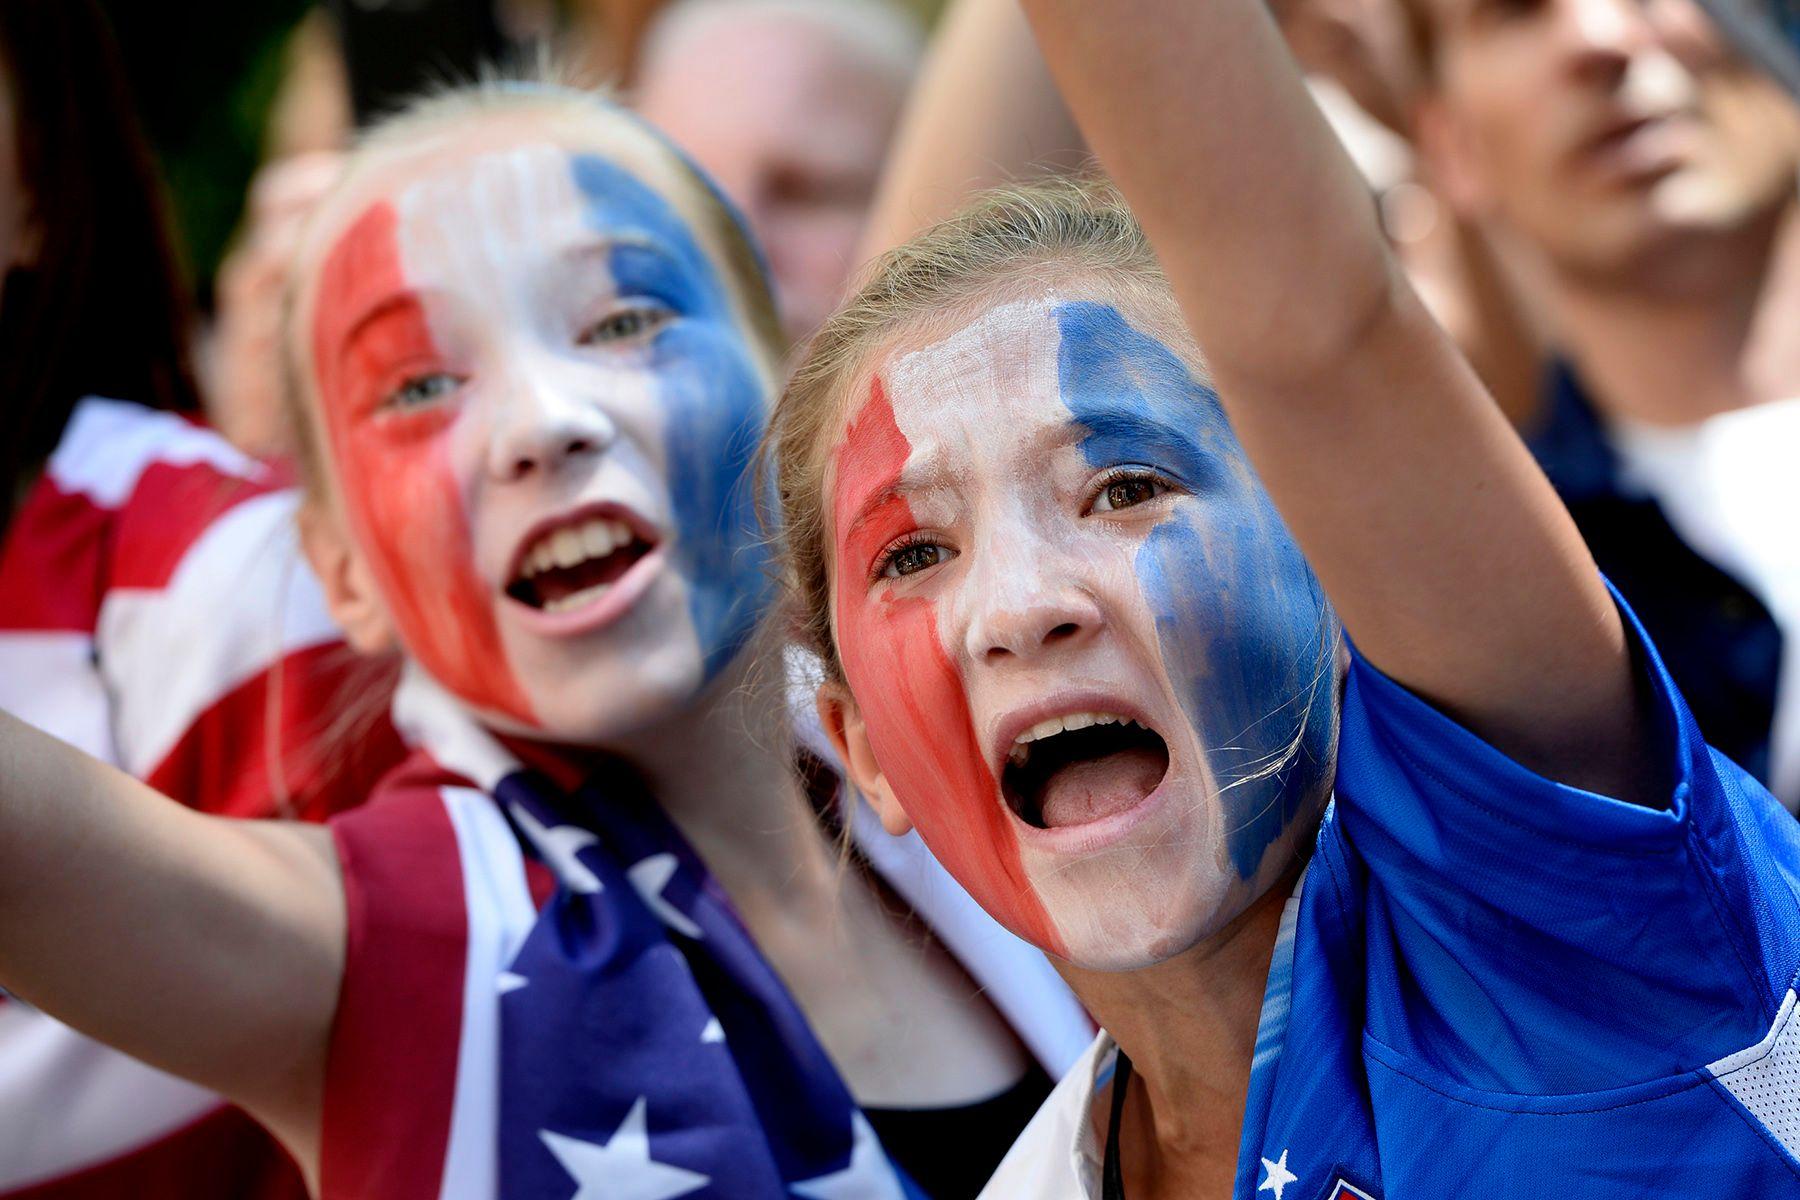 2015 FIFA Women's World Cup Champion U.S. Women's National Team.